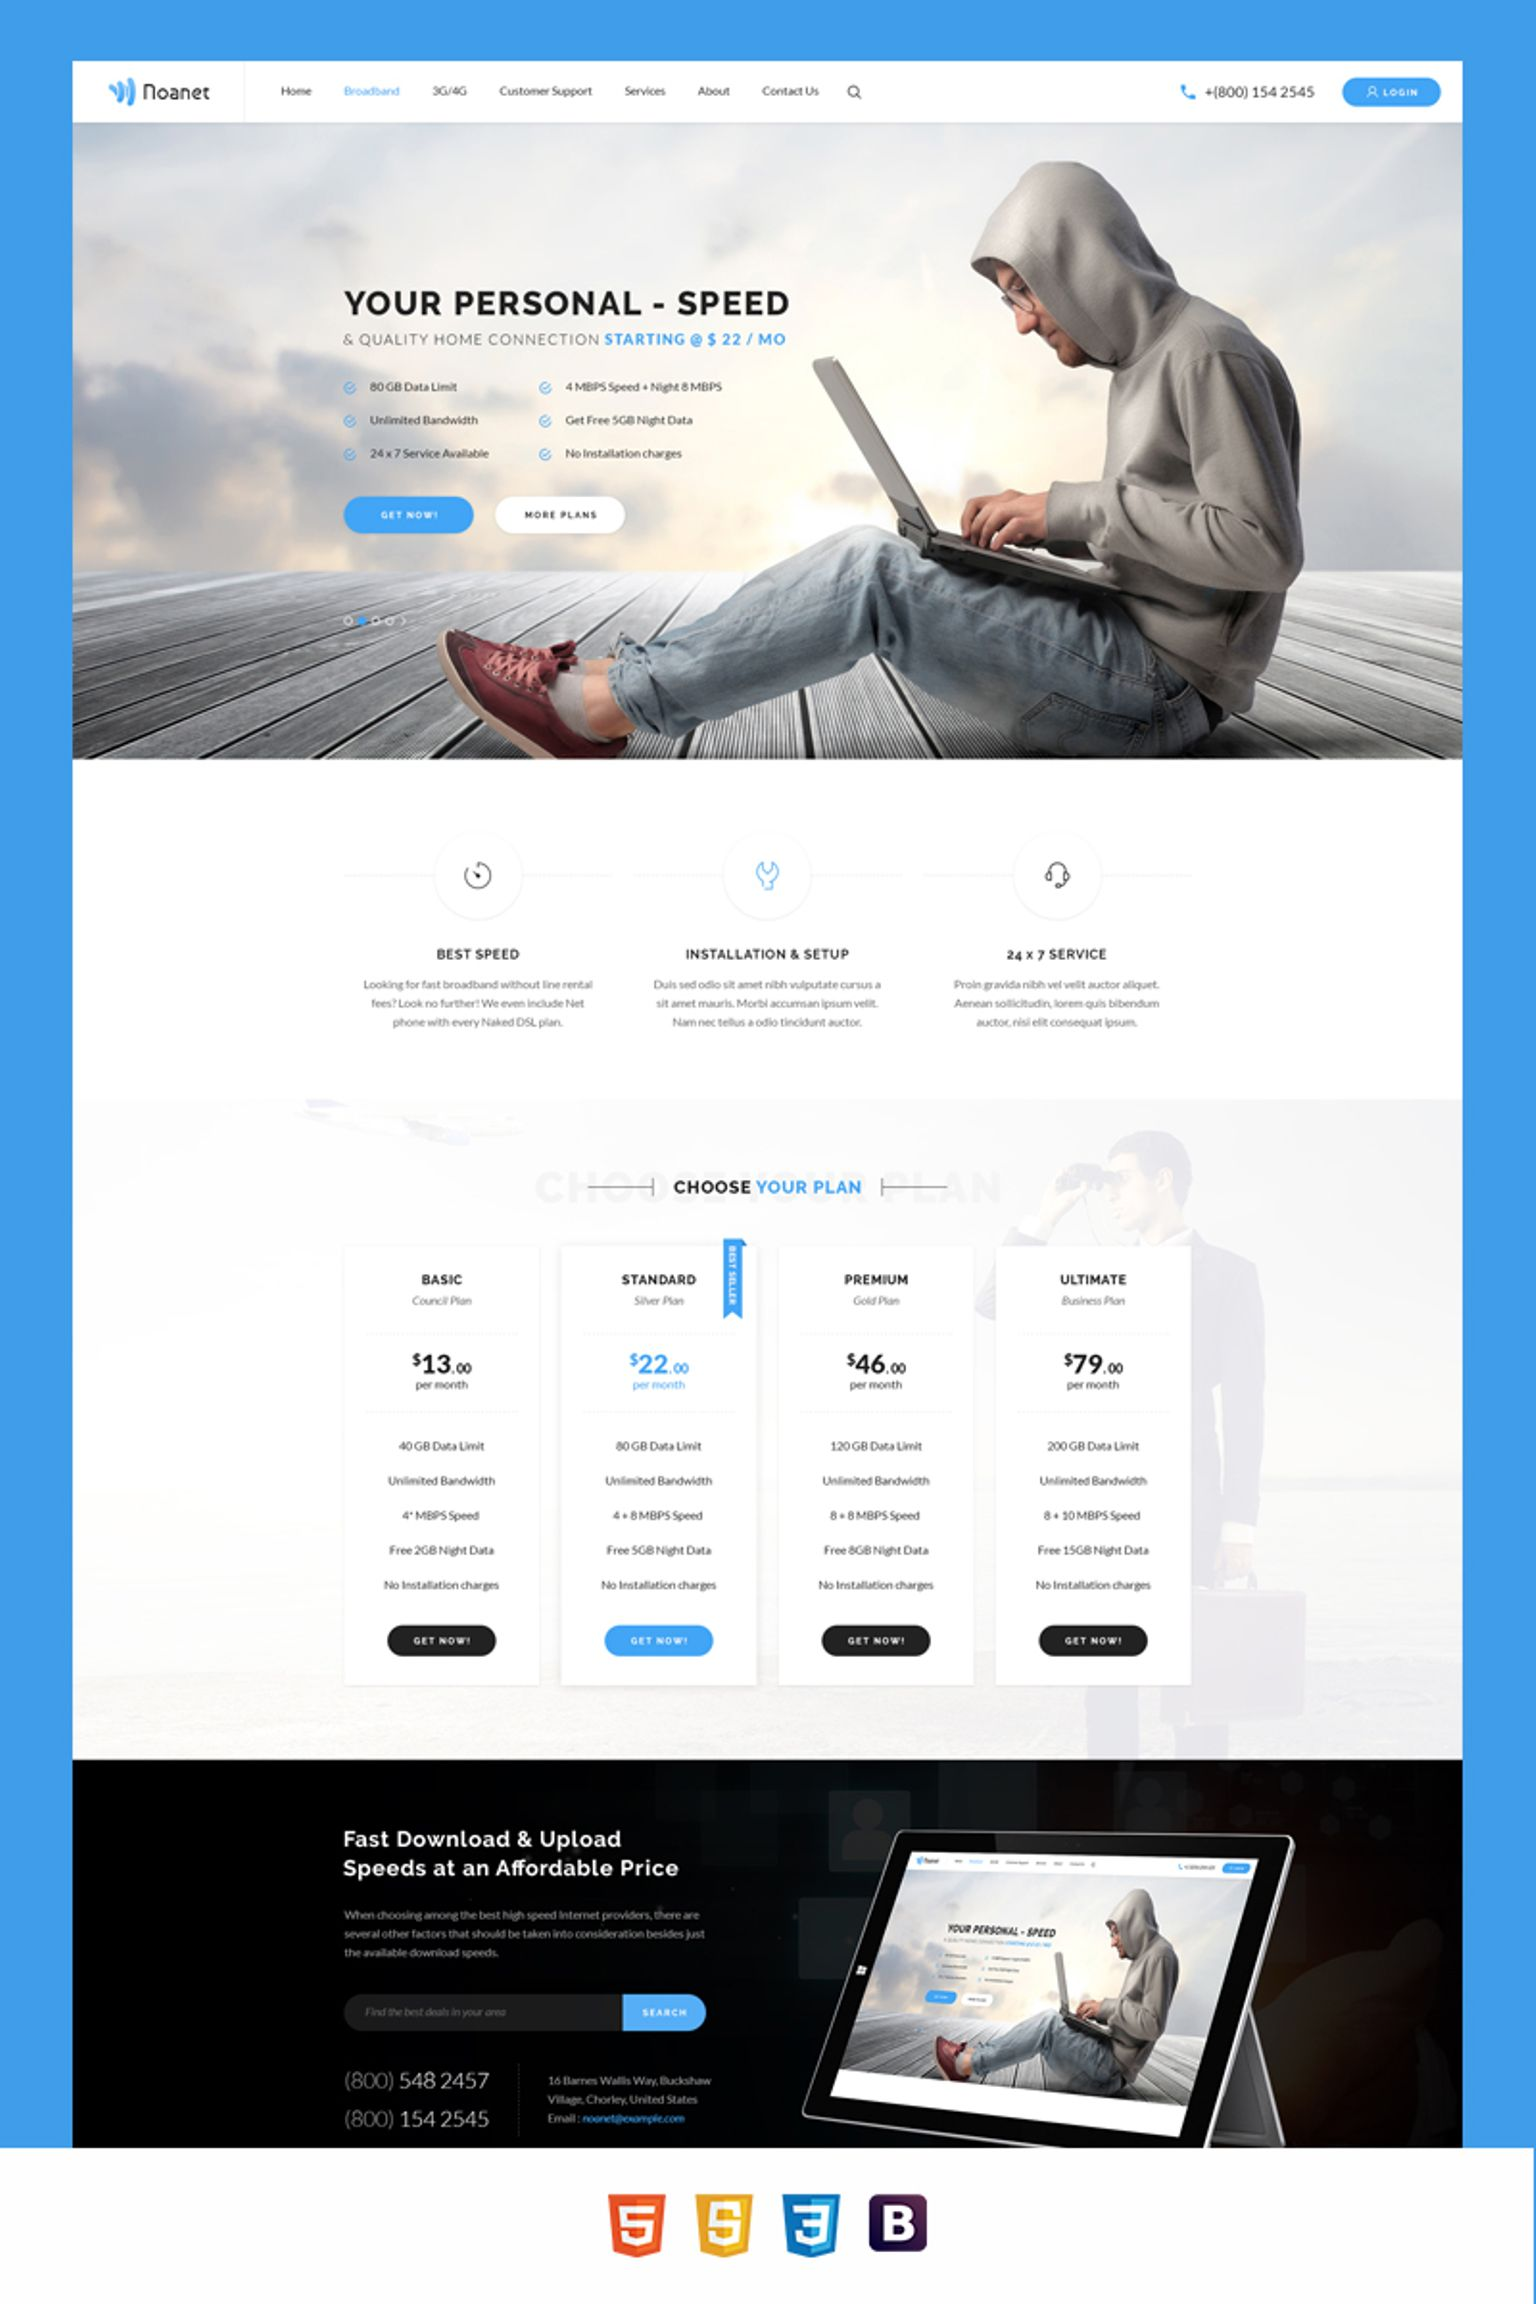 Noanet Internet Provider and Digital Network Website Template #64705